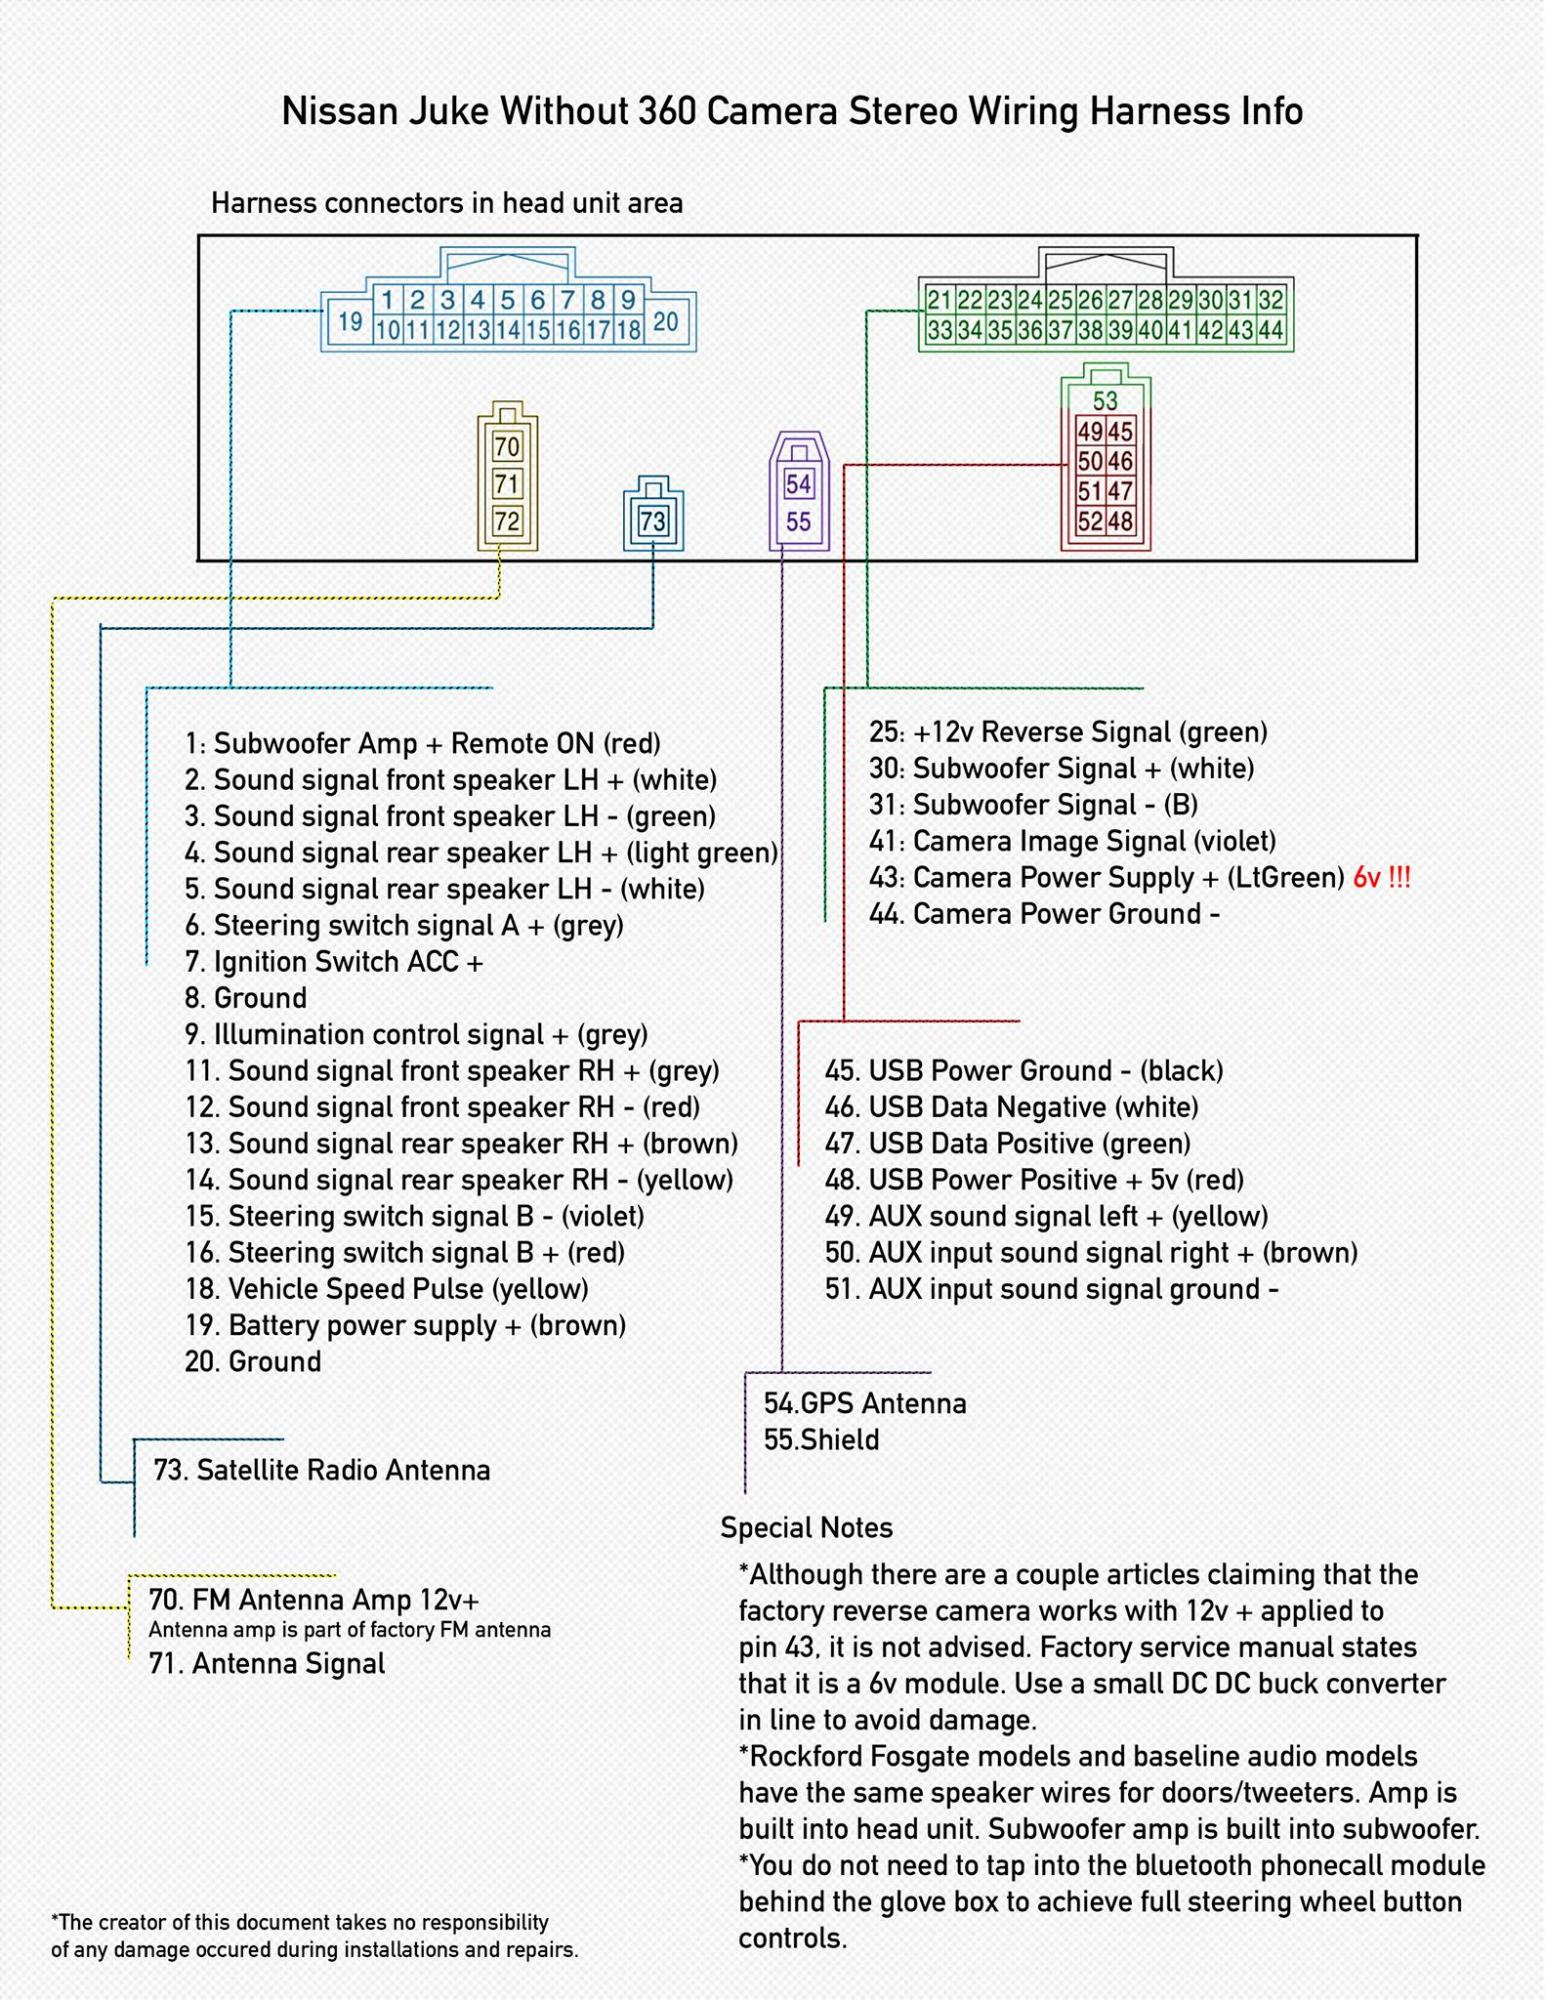 Juke Audio Wiring Info Nissan